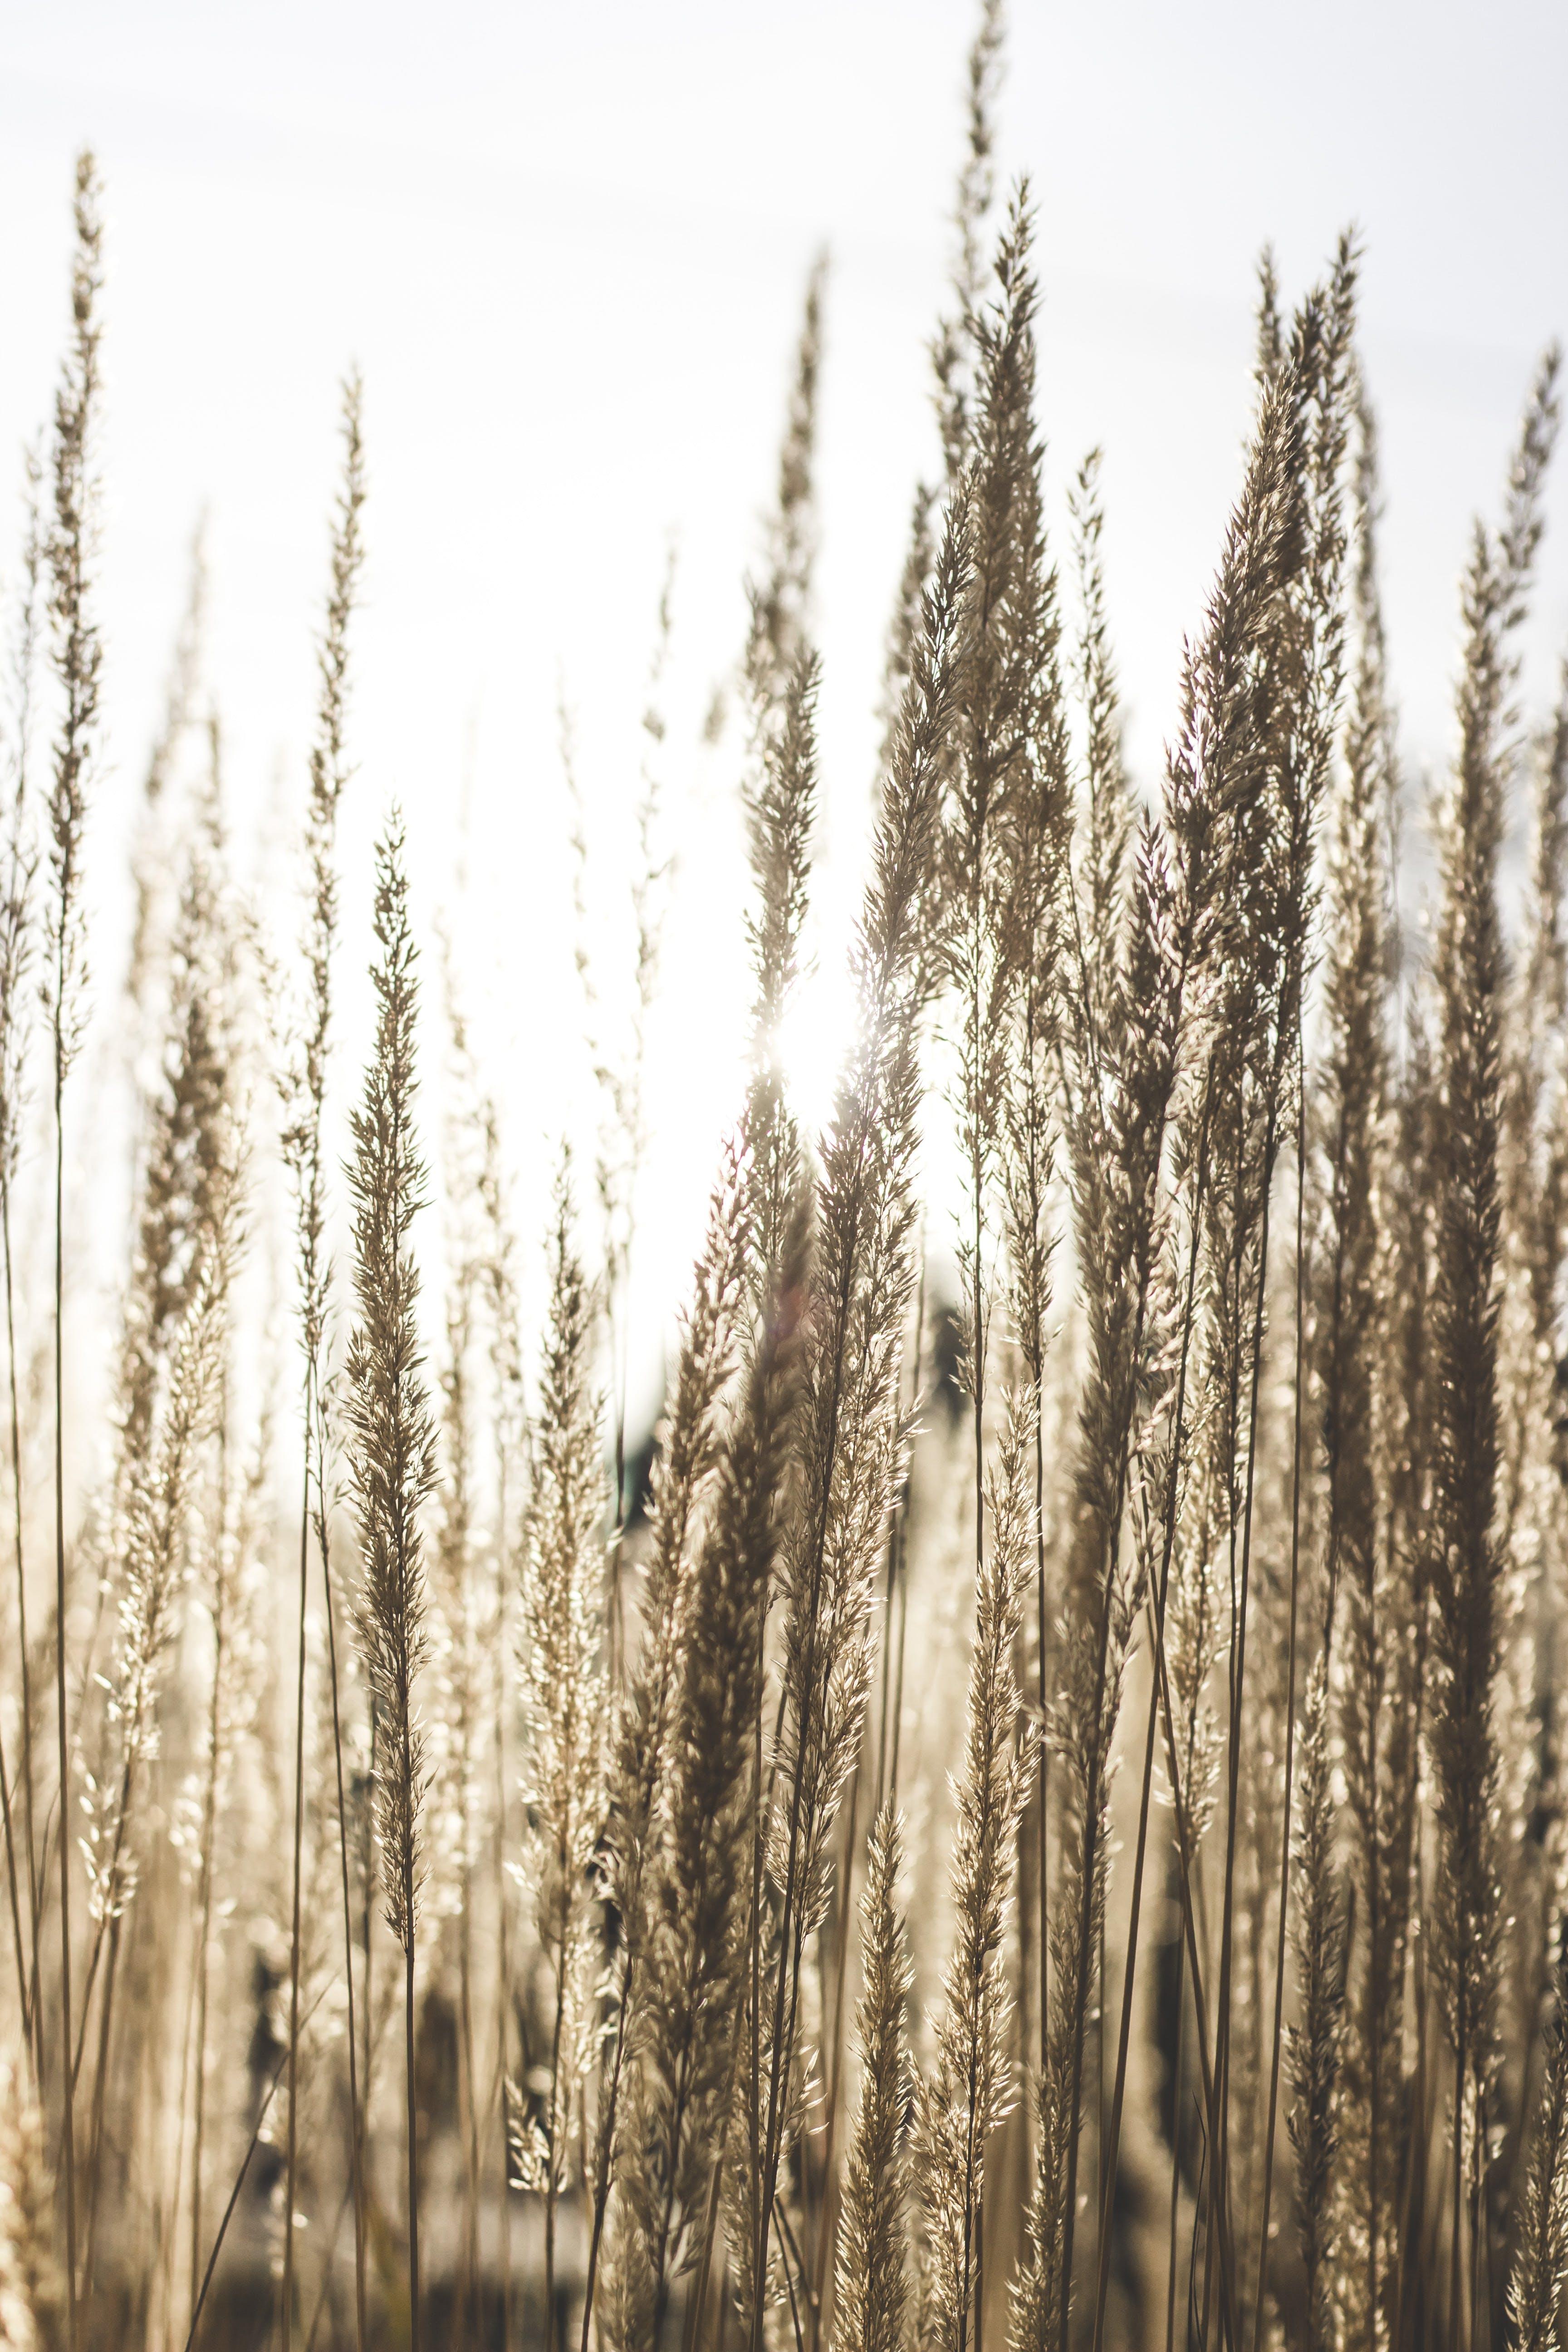 Fotos de stock gratuitas de campo de trigo, campos de cultivo, césped, cosecha